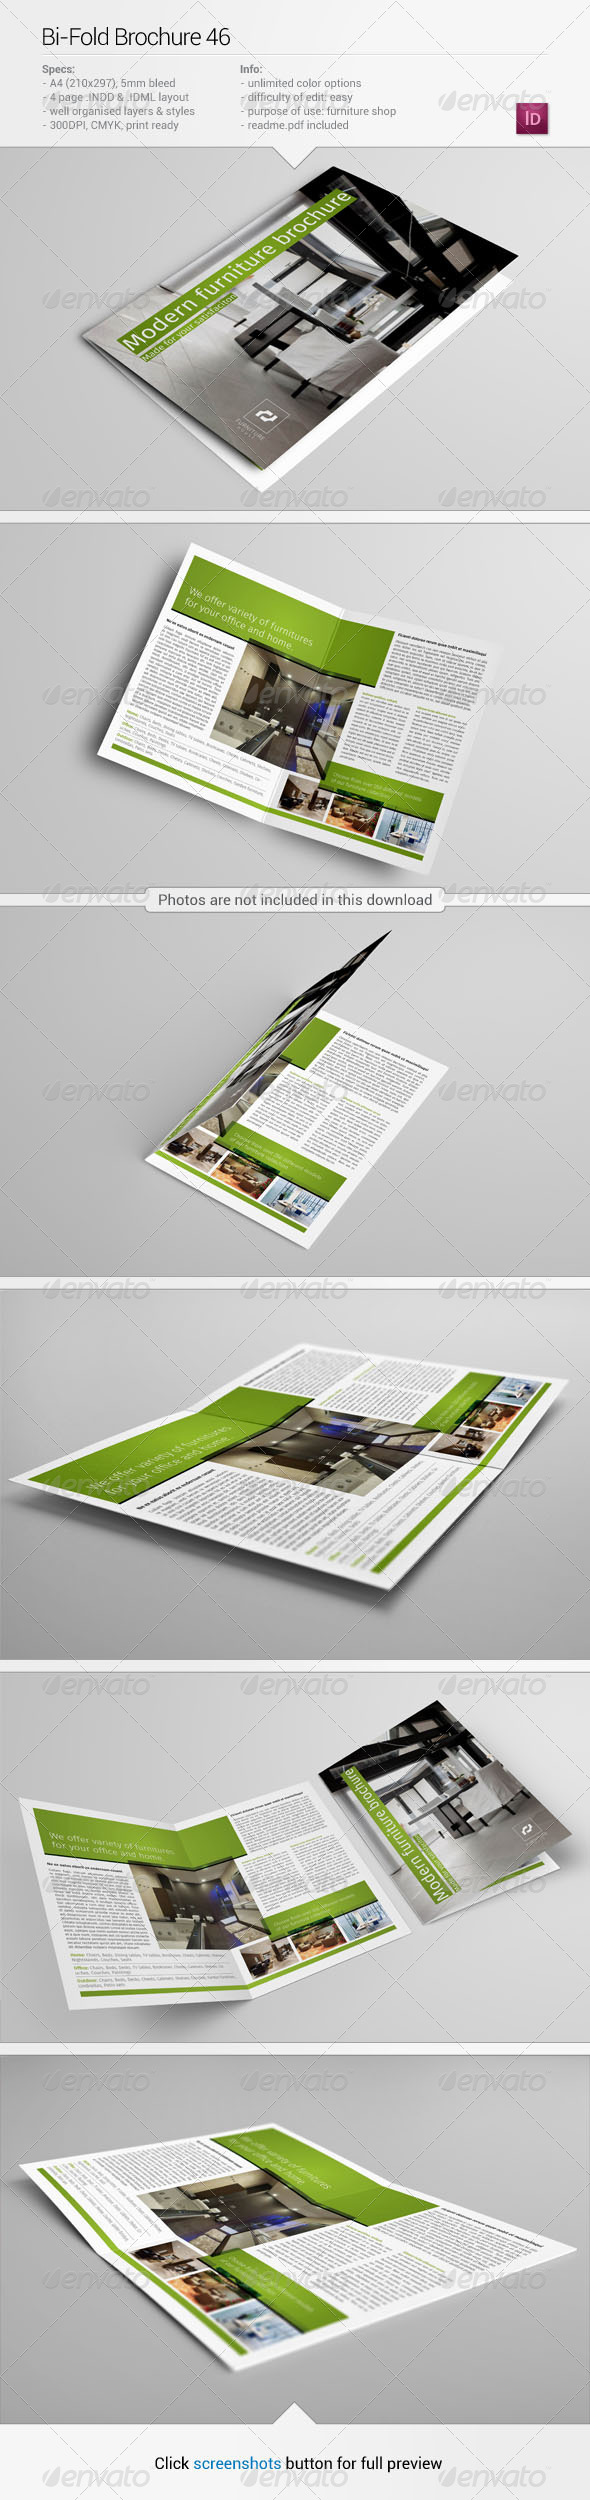 GraphicRiver Bi-Fold Brochure 46 6270351